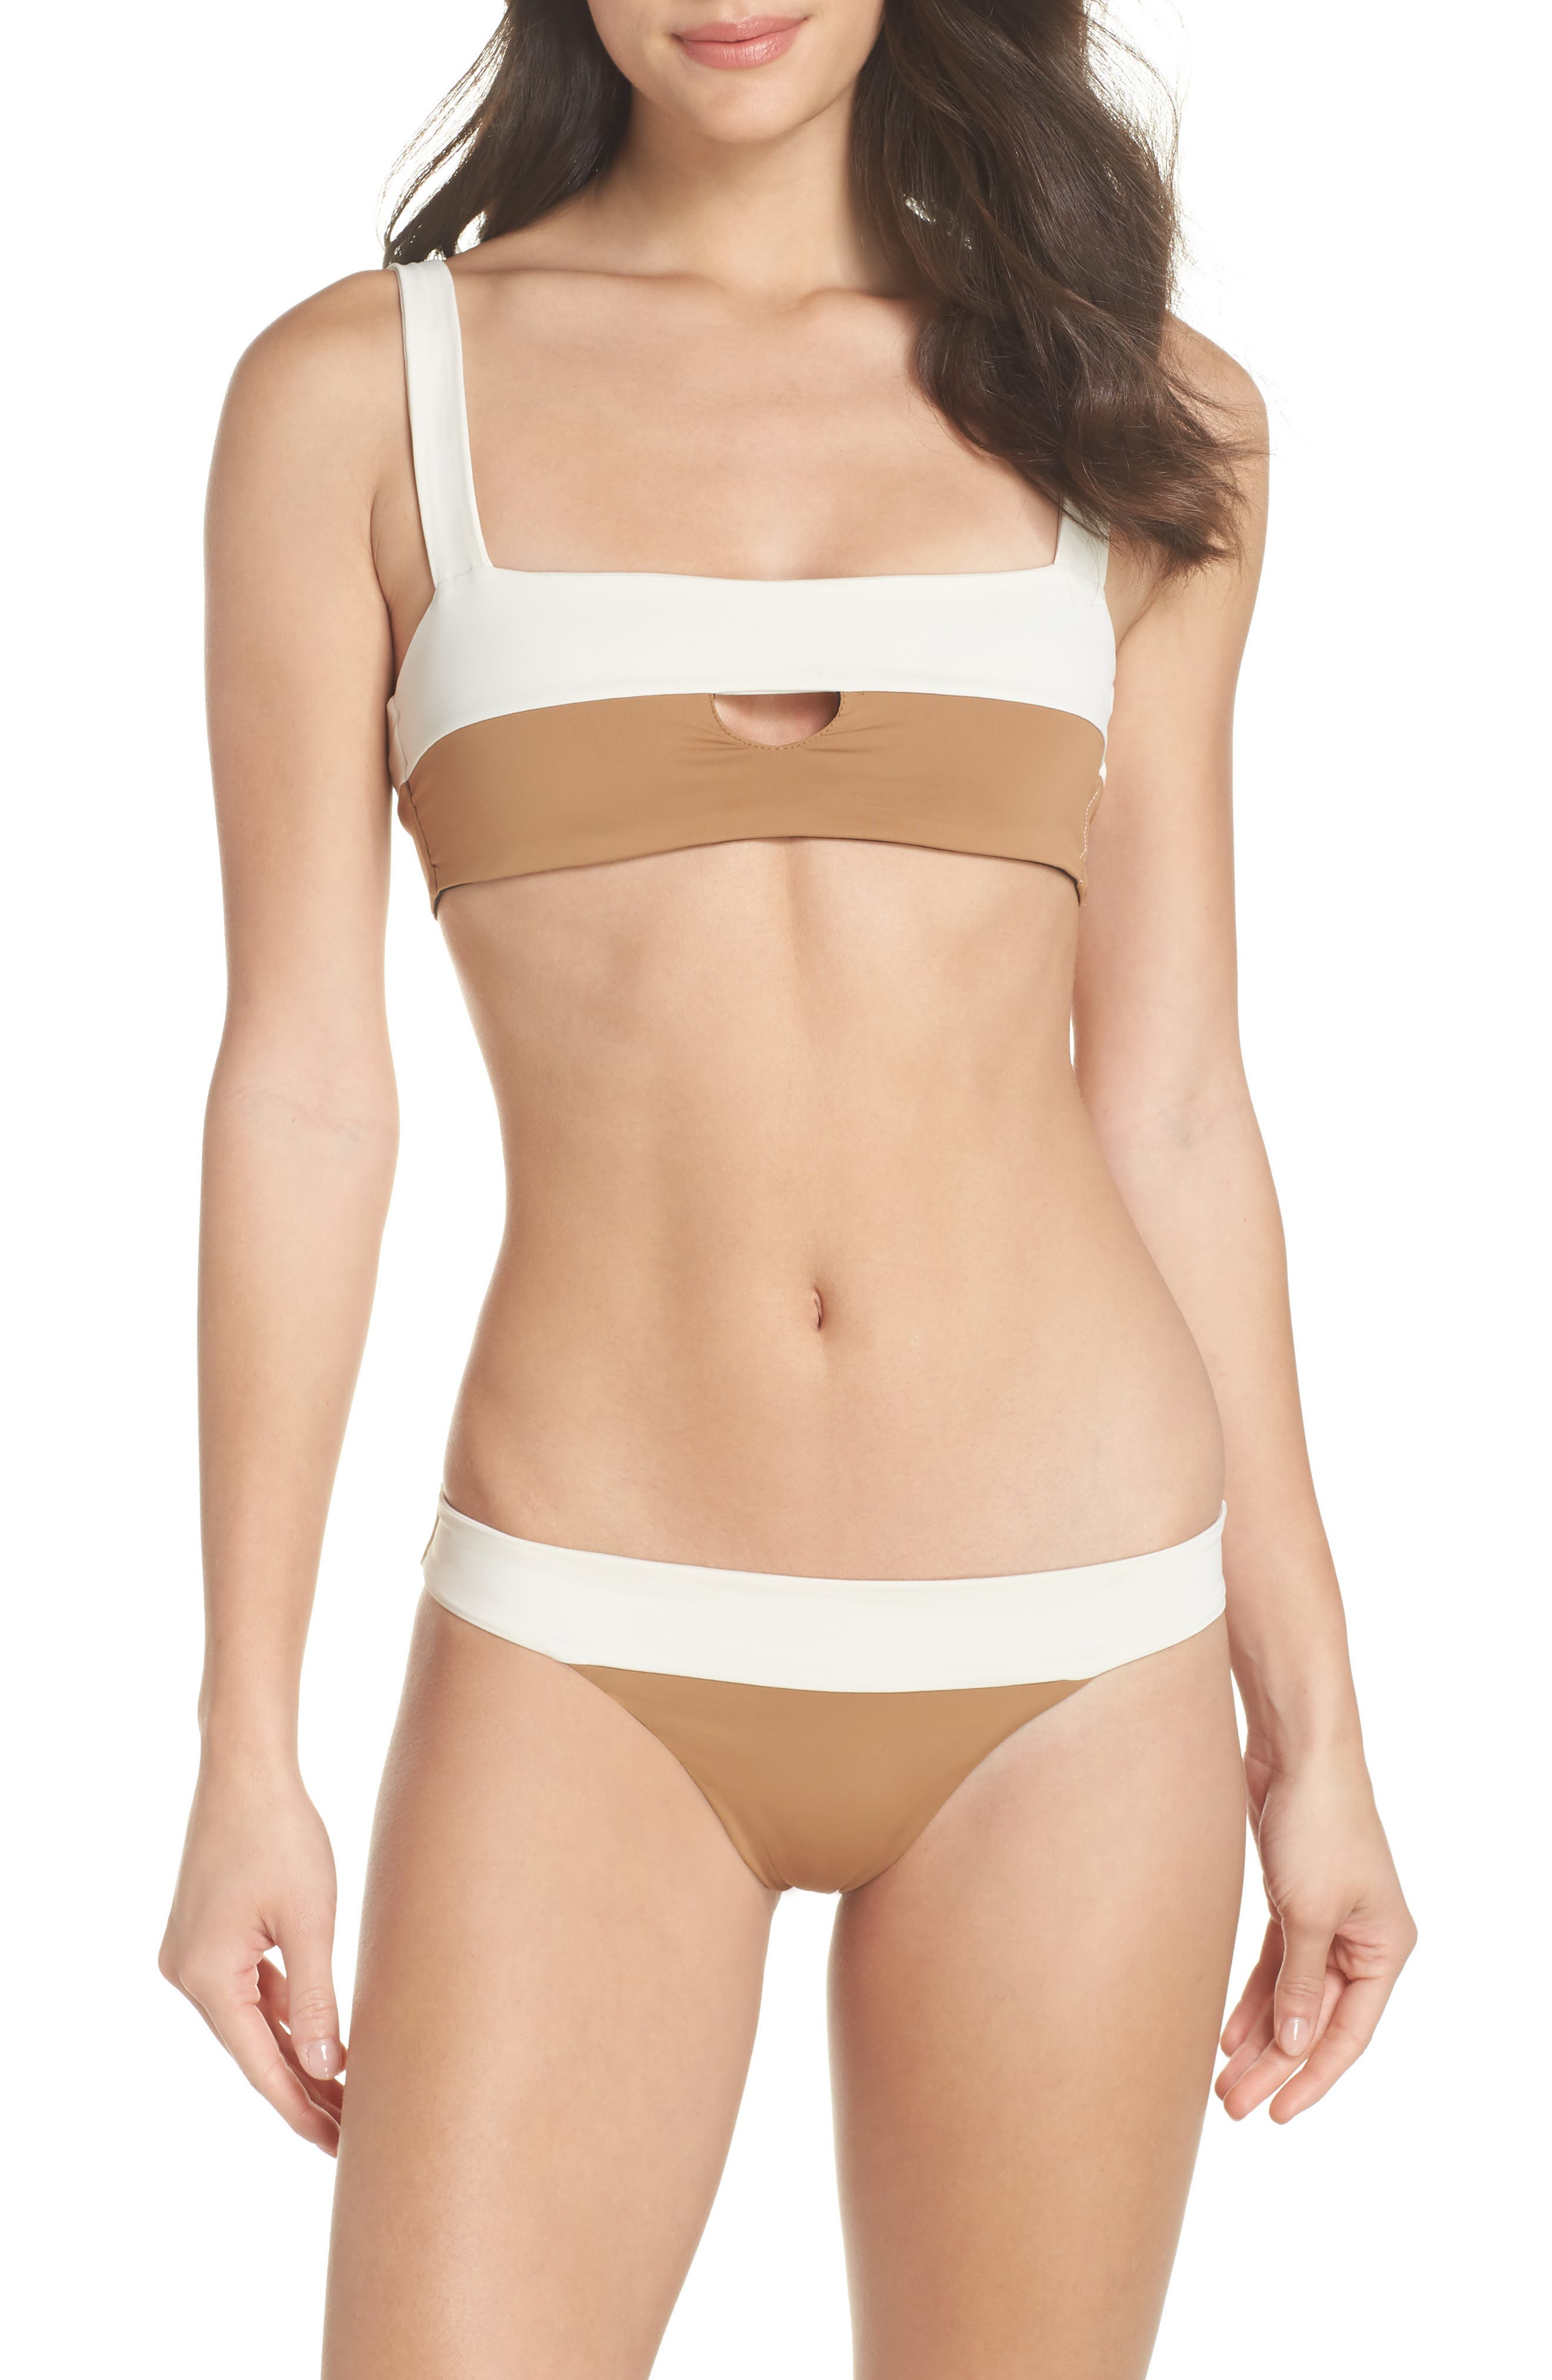 Reversible Bikini Bottom,                             Alternate thumbnail 10, color,                             CREAM/ BLACK/ CAMEL